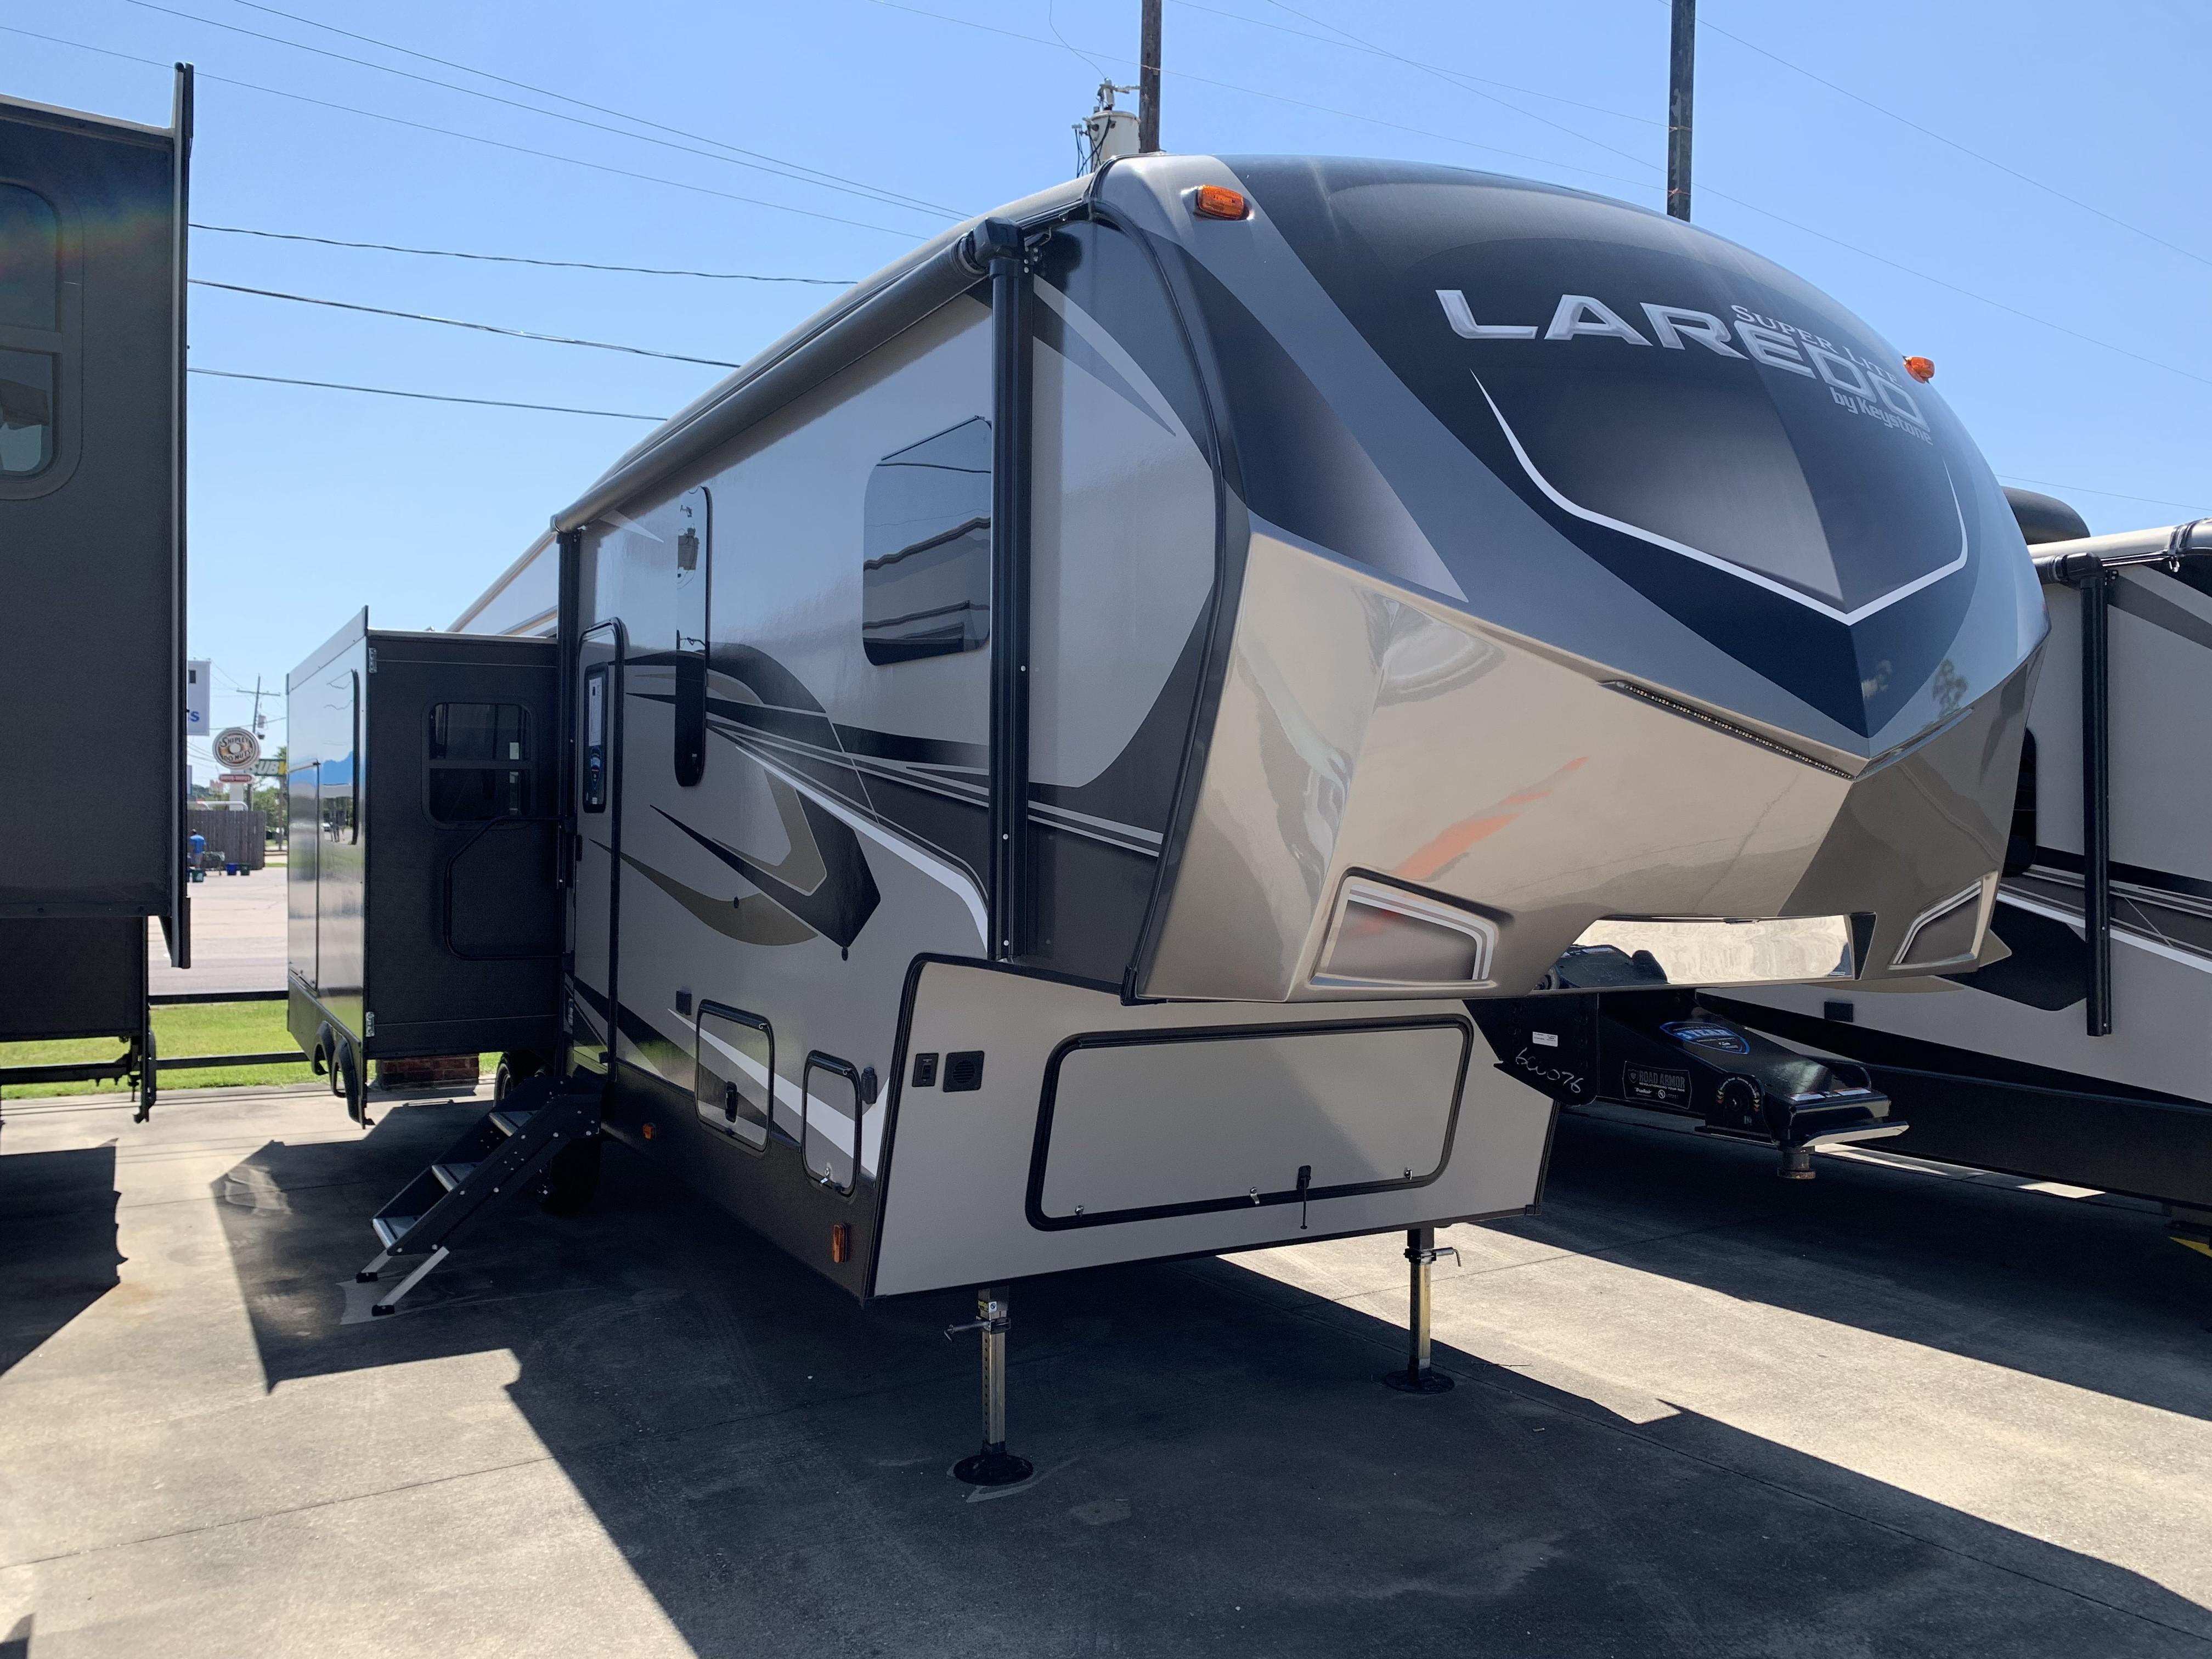 RV Dealer in Orange, TX | RVs, Fifth Wheels, Travel Trailers